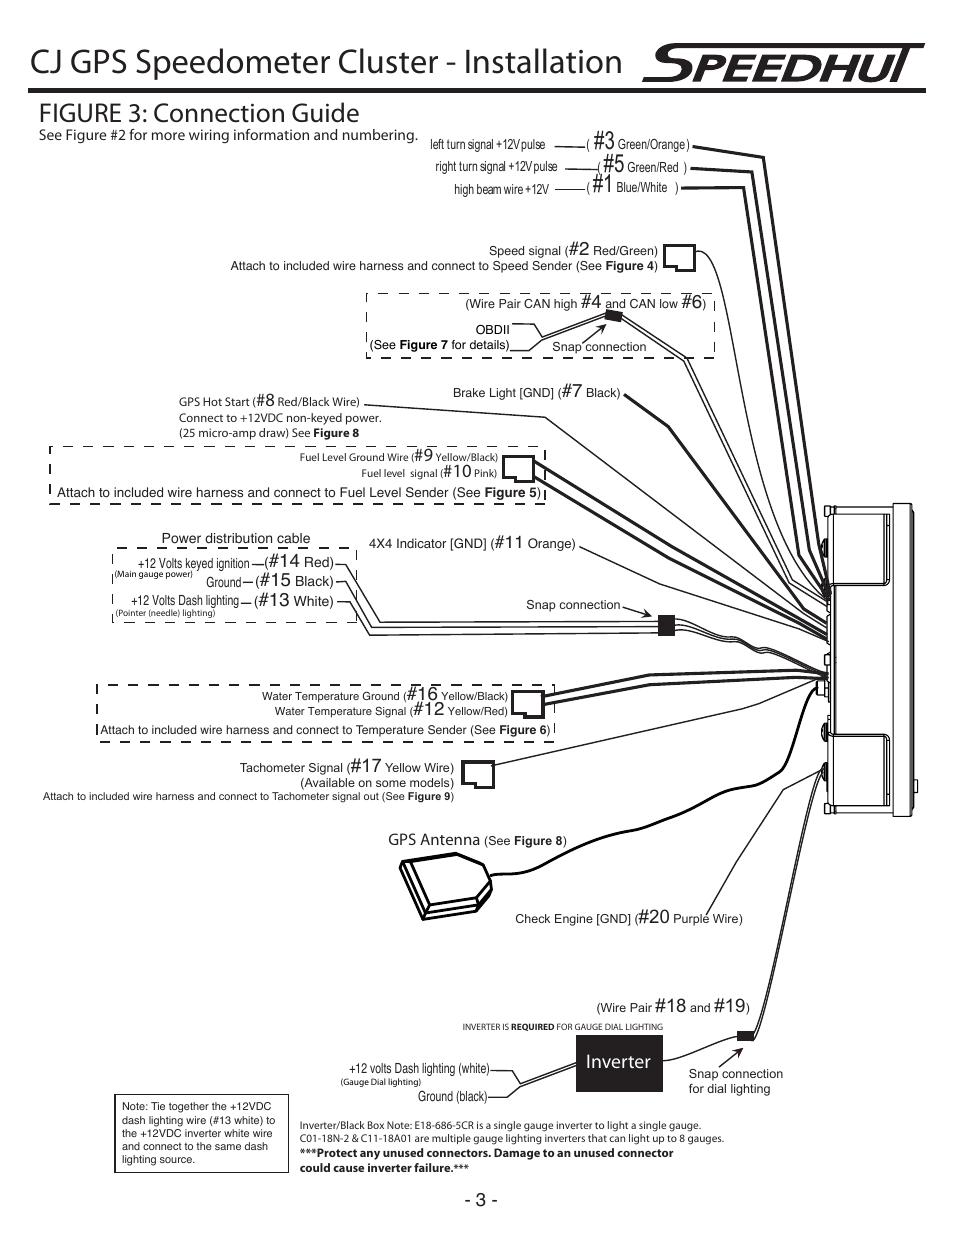 hight resolution of cj gps speedometer cluster installation figure 3 connection guide inverter speedhut